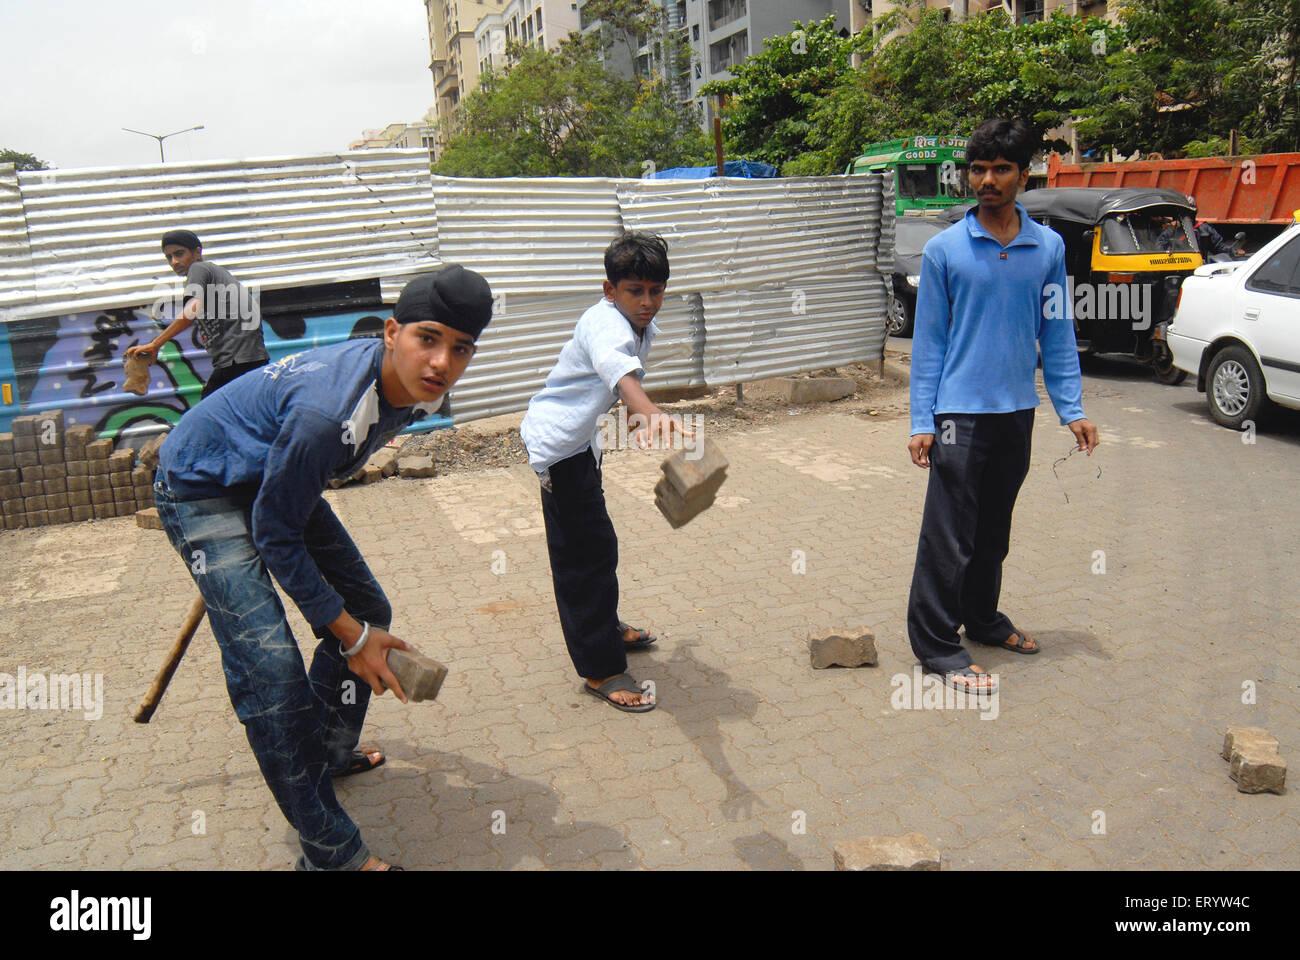 Sikh community protest against firing bodyguard of dera saccha sauda chief ram rahim at Mulund in Bombay Mumbai - Stock Image